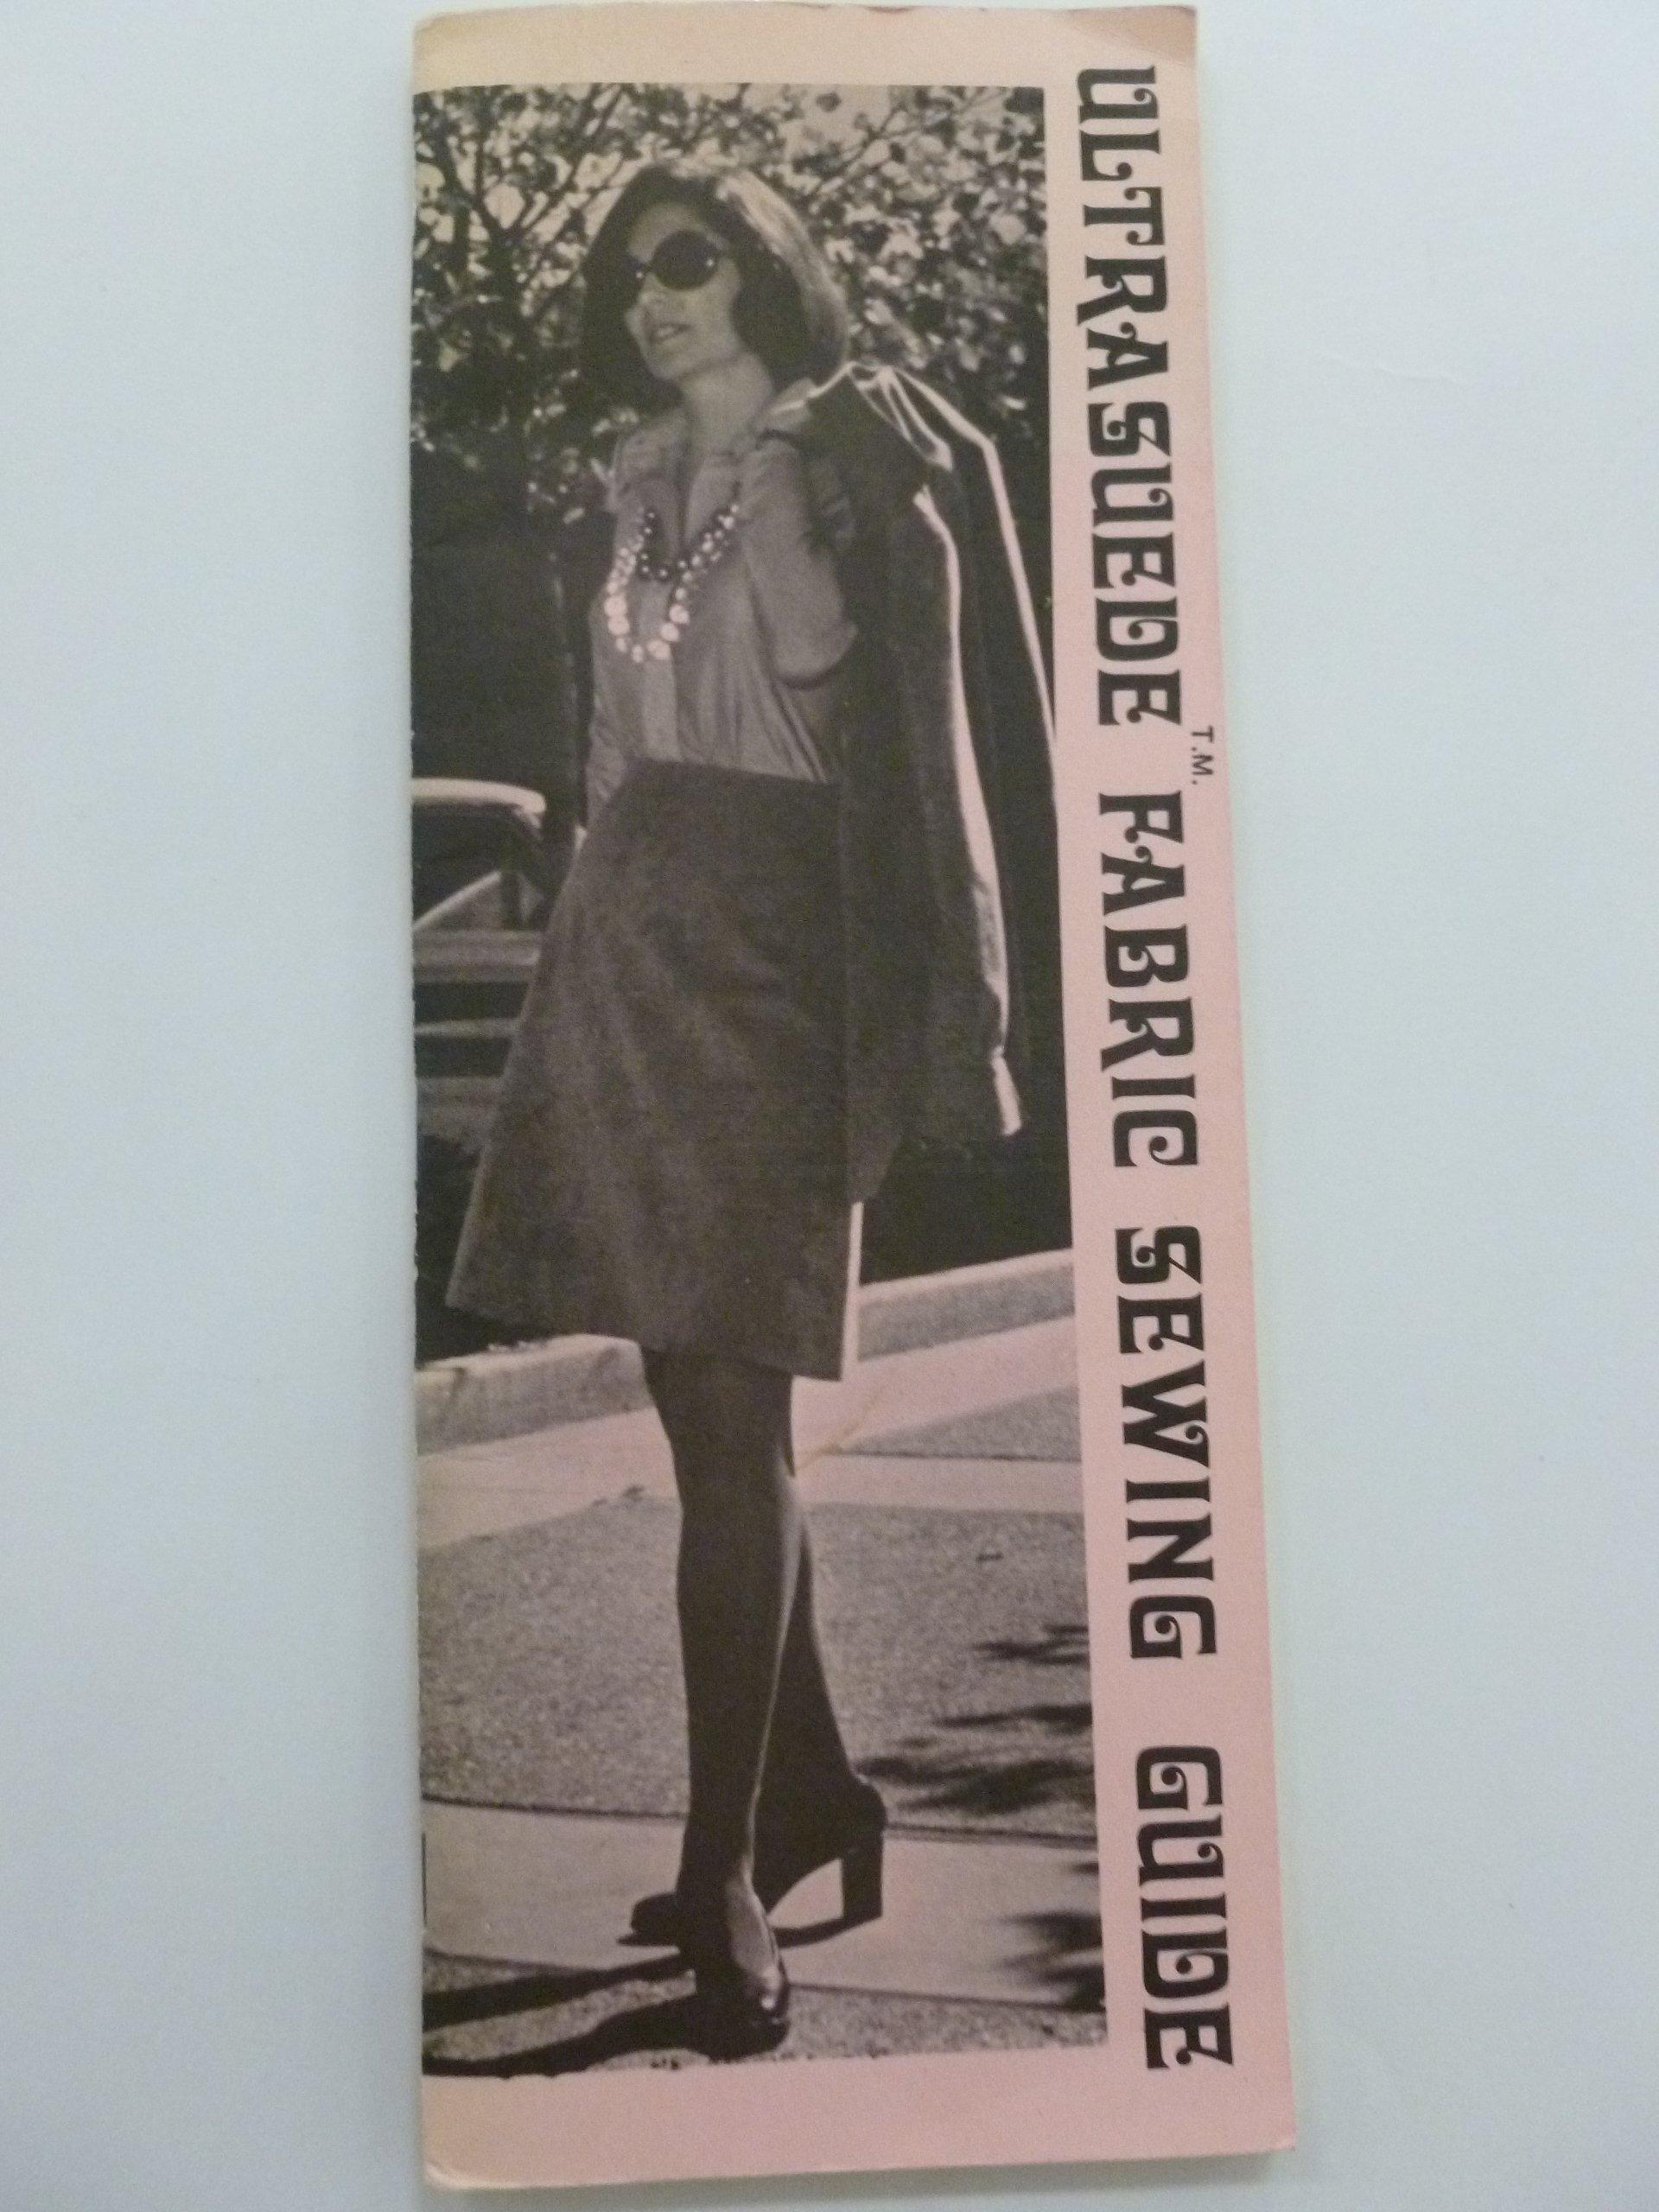 Ultrasuede Fabric Sewing Guide Sew As High Fashion Designers Do Corbin Krestine Illustrated Amazon Com Books